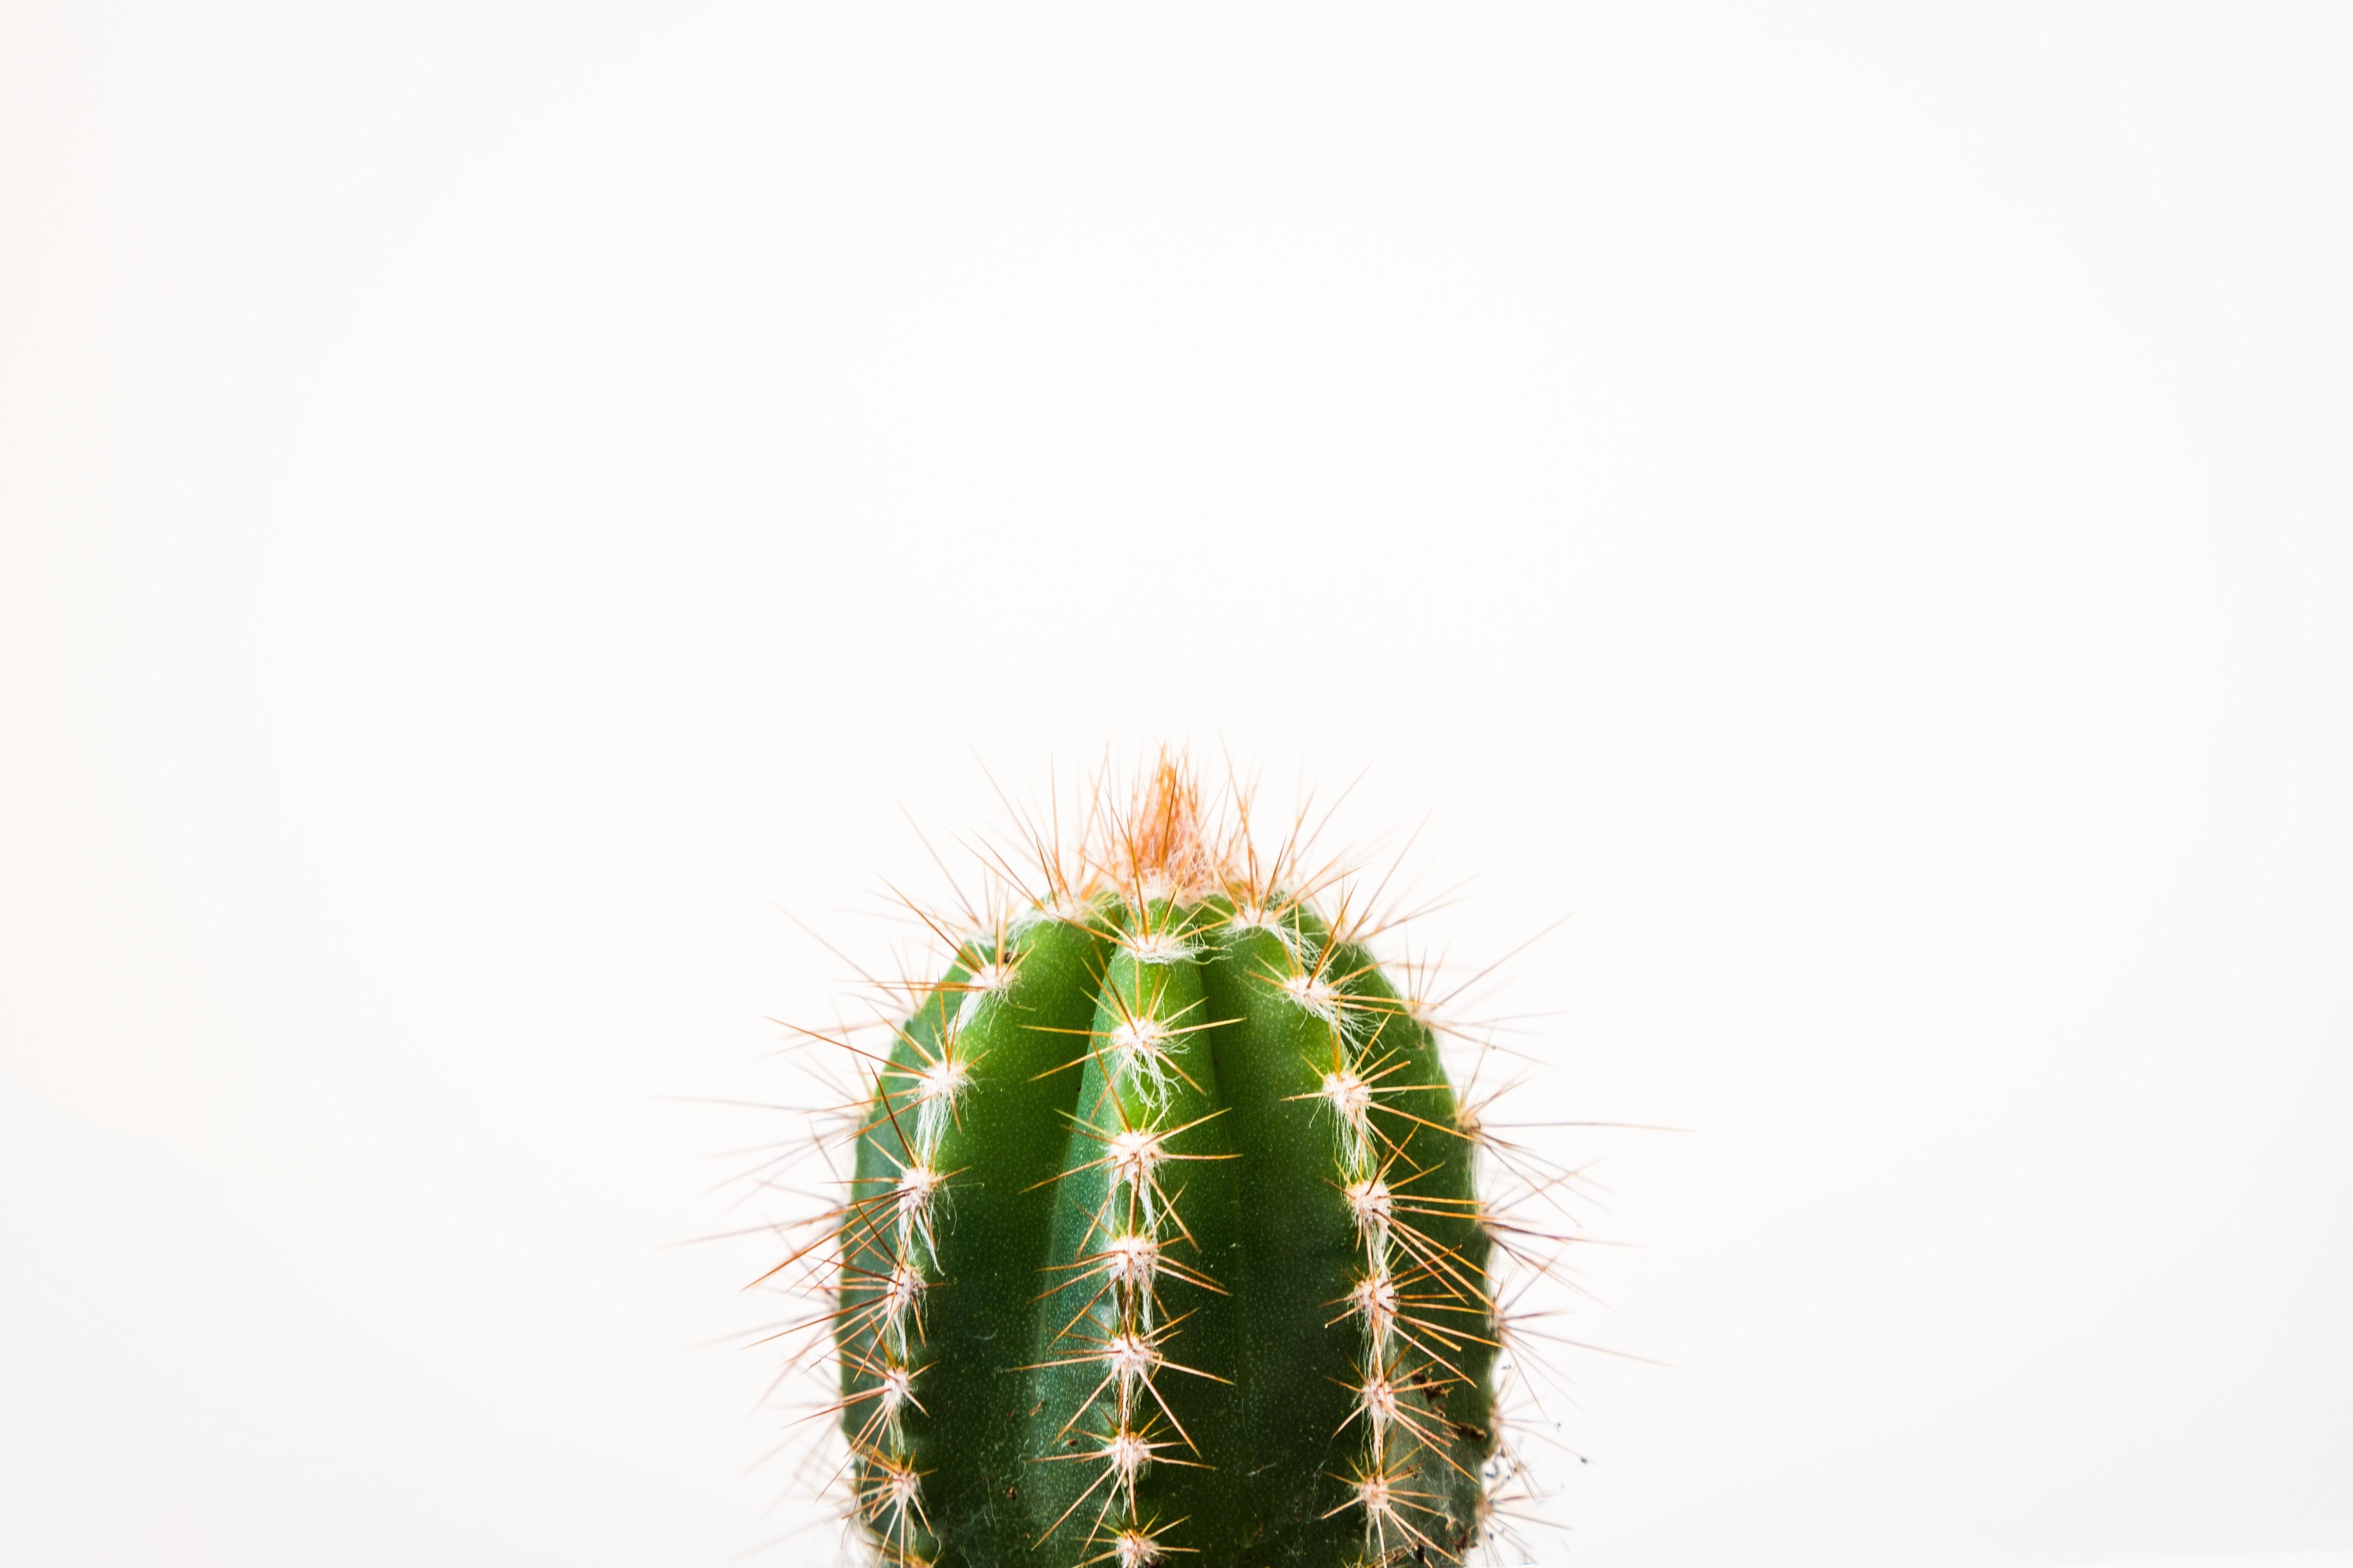 closeup photo of cactus against white background